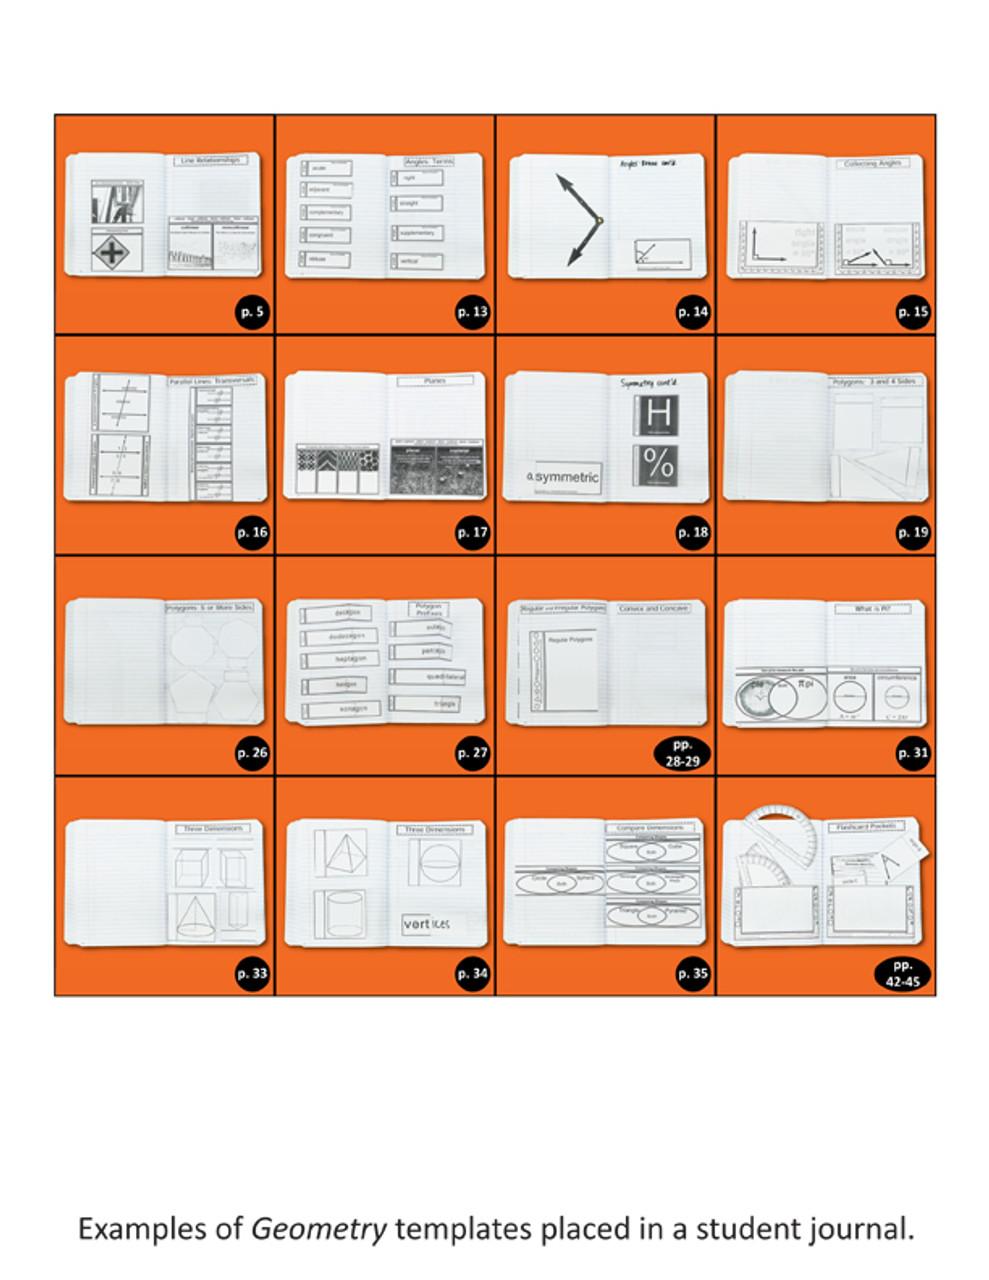 Nc geometry nov10 layout 1 (page 03) copy